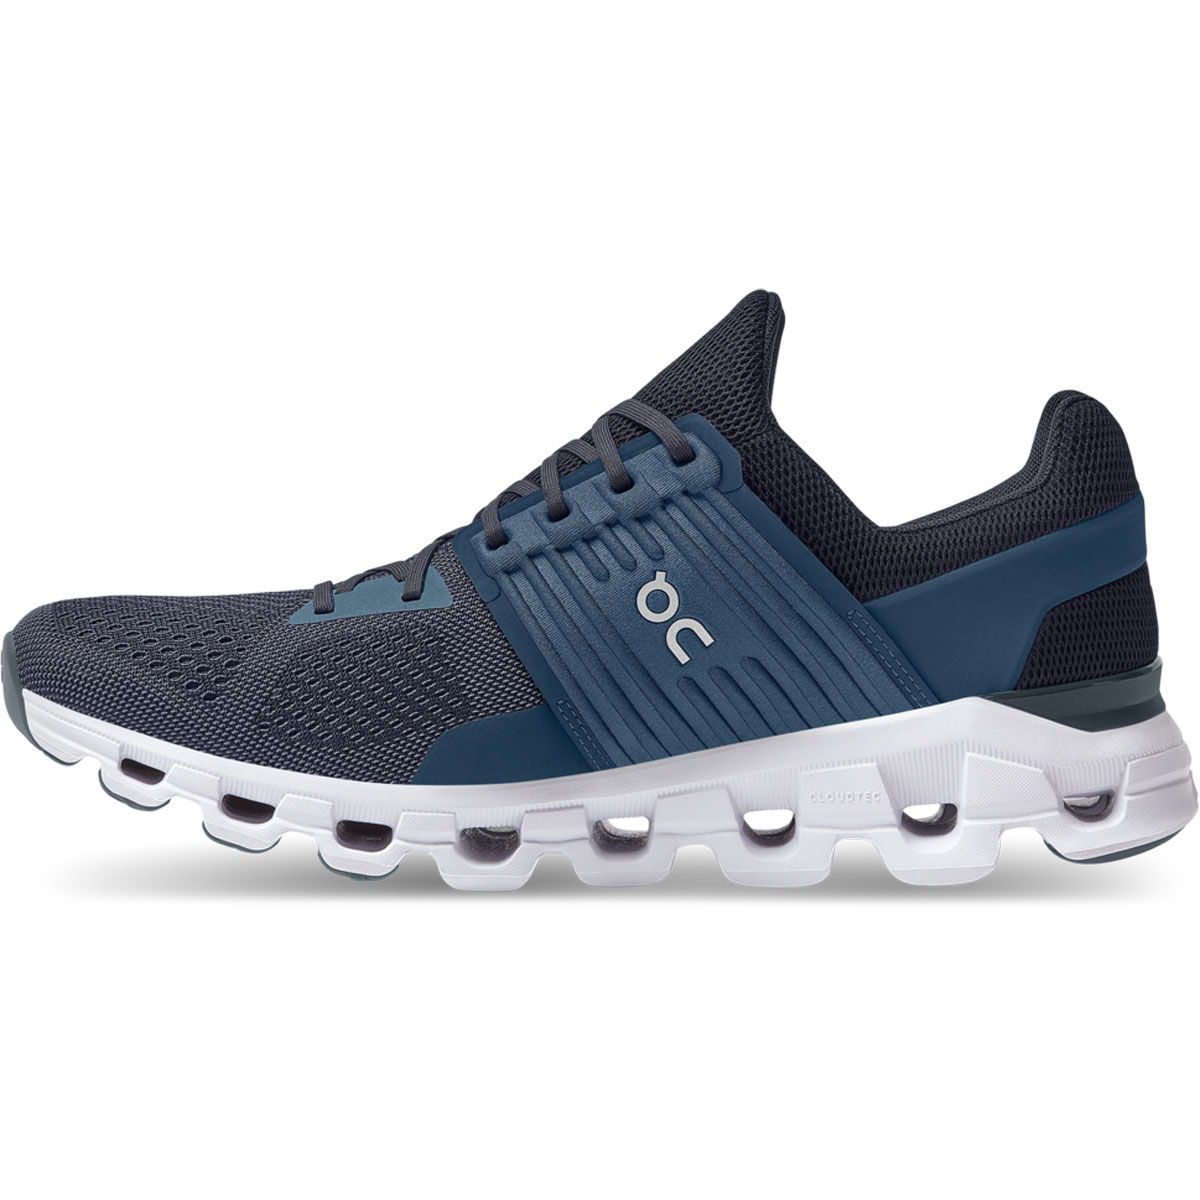 Men's On Cloudswift 2.0 Running Shoe - Color: Denim/Midnight - Size: 7 - Width: Regular, Denim/Midnight, large, image 2